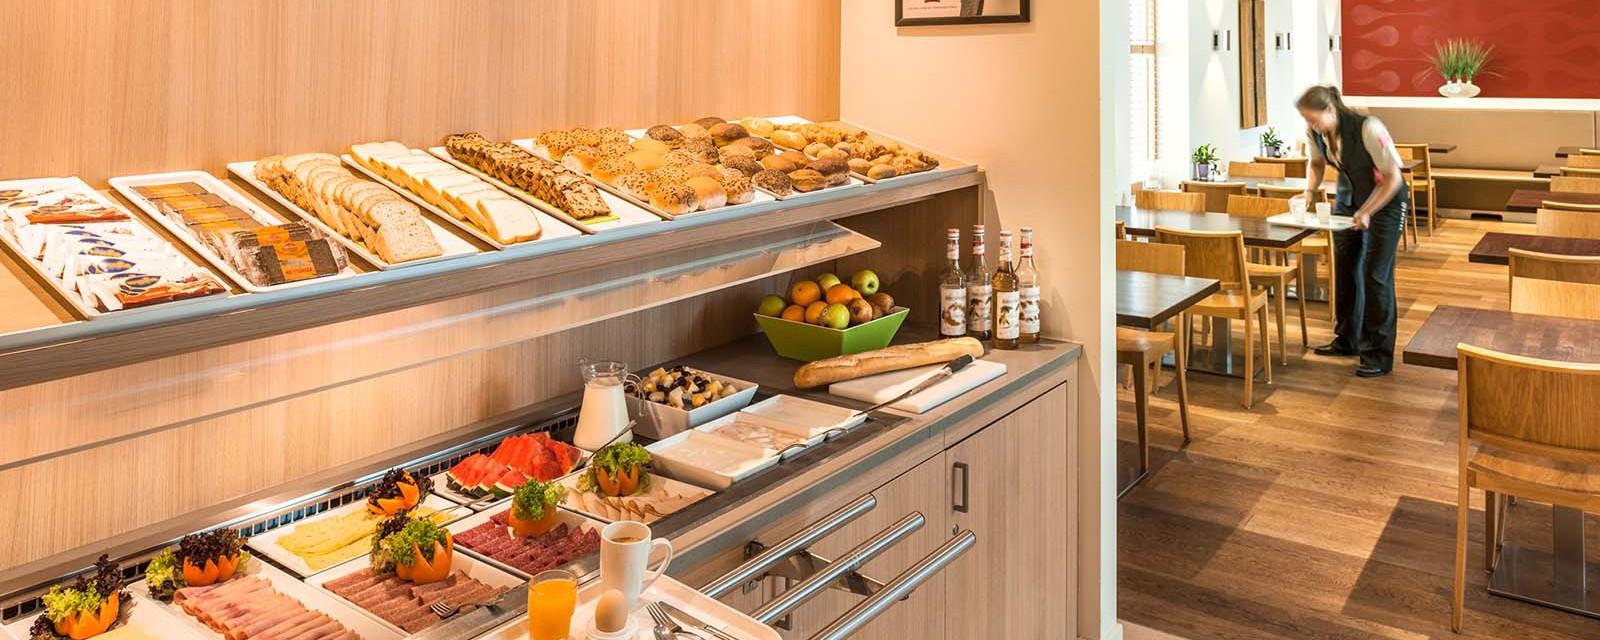 Ibis Hotel den Haag Scheveningen - Breakfast Buffet